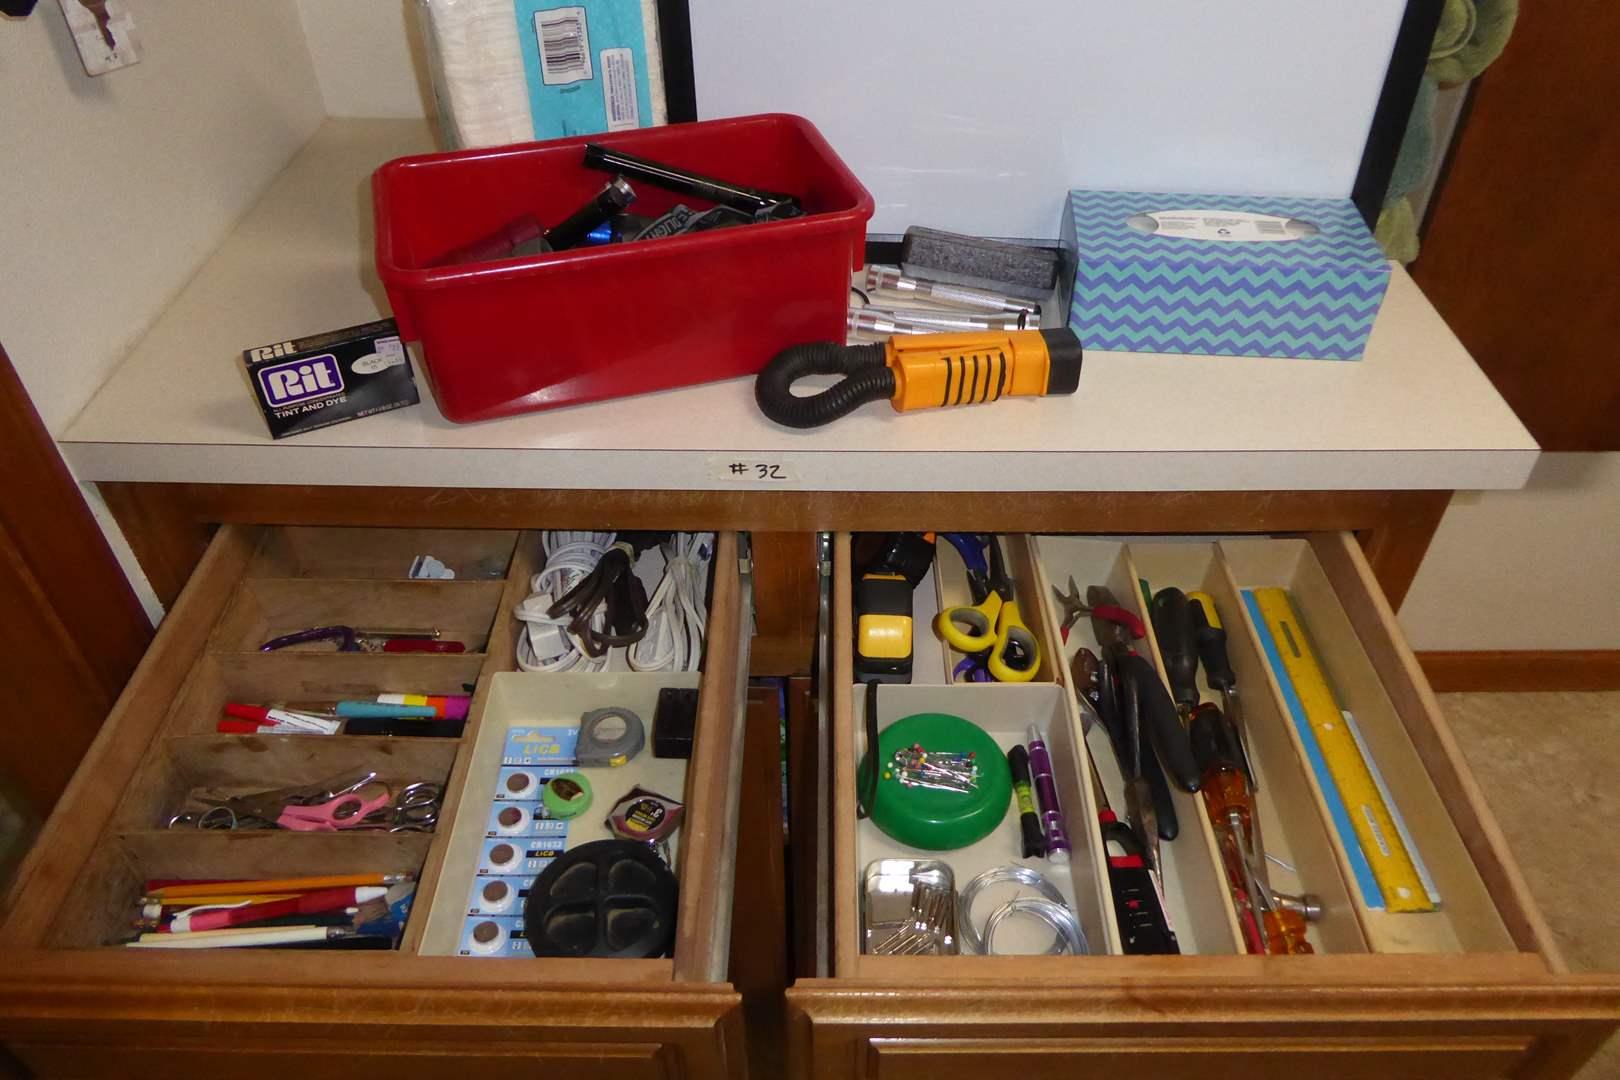 Lot # 32 - Flashlights, White Board, Scissors, Tools & More  (main image)